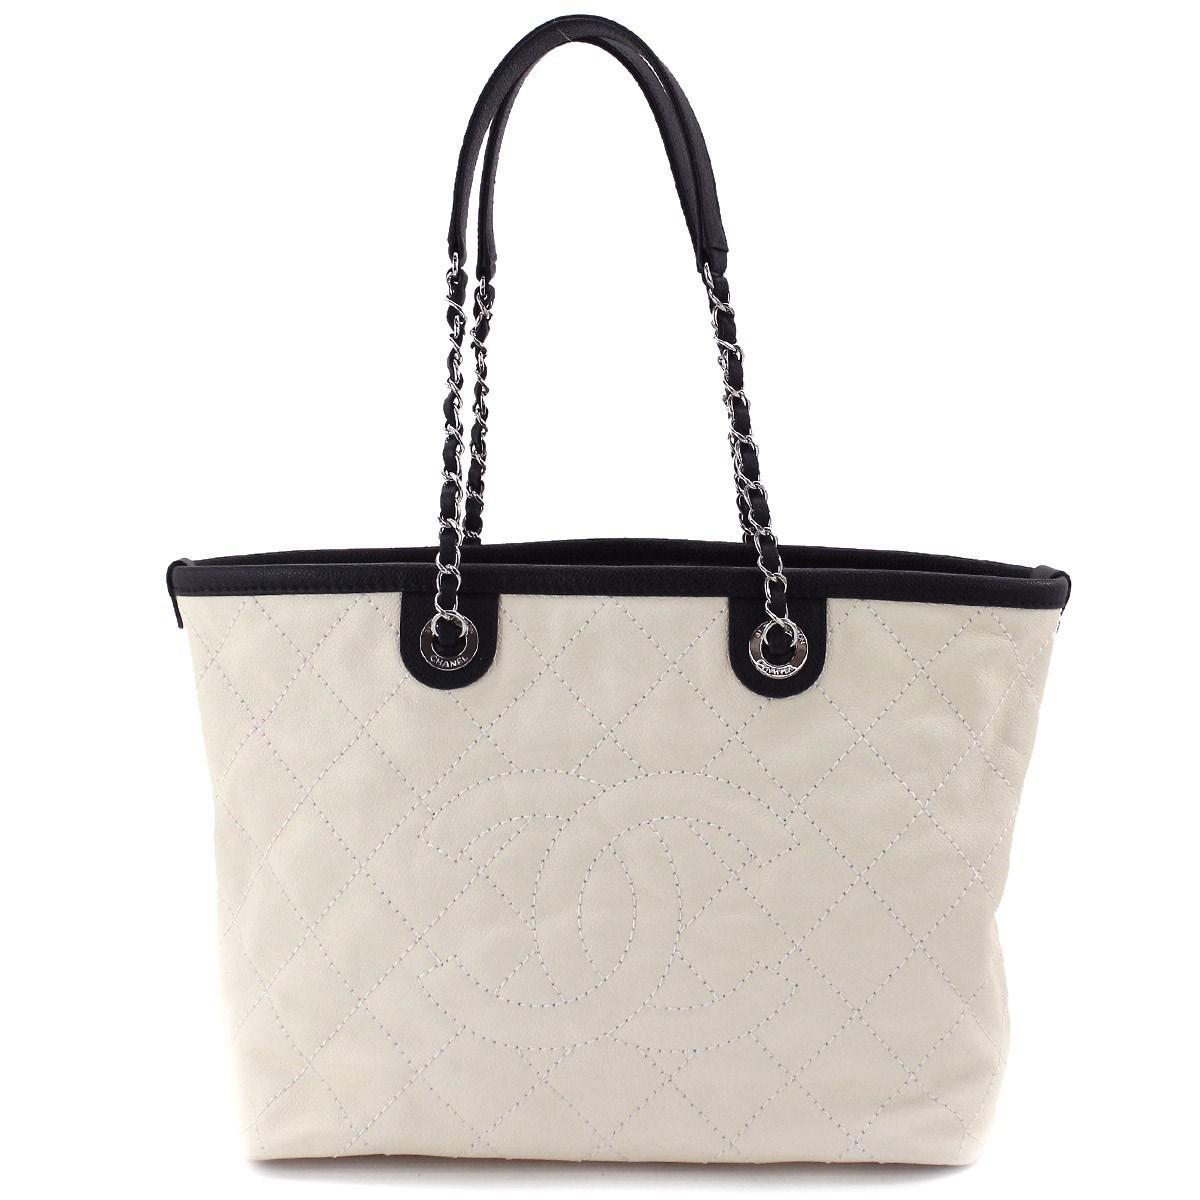 1dc36119ba5 Lyst - Chanel Caviar Skin Leather Cc Chain Shoulder Tote Bag Cream ...